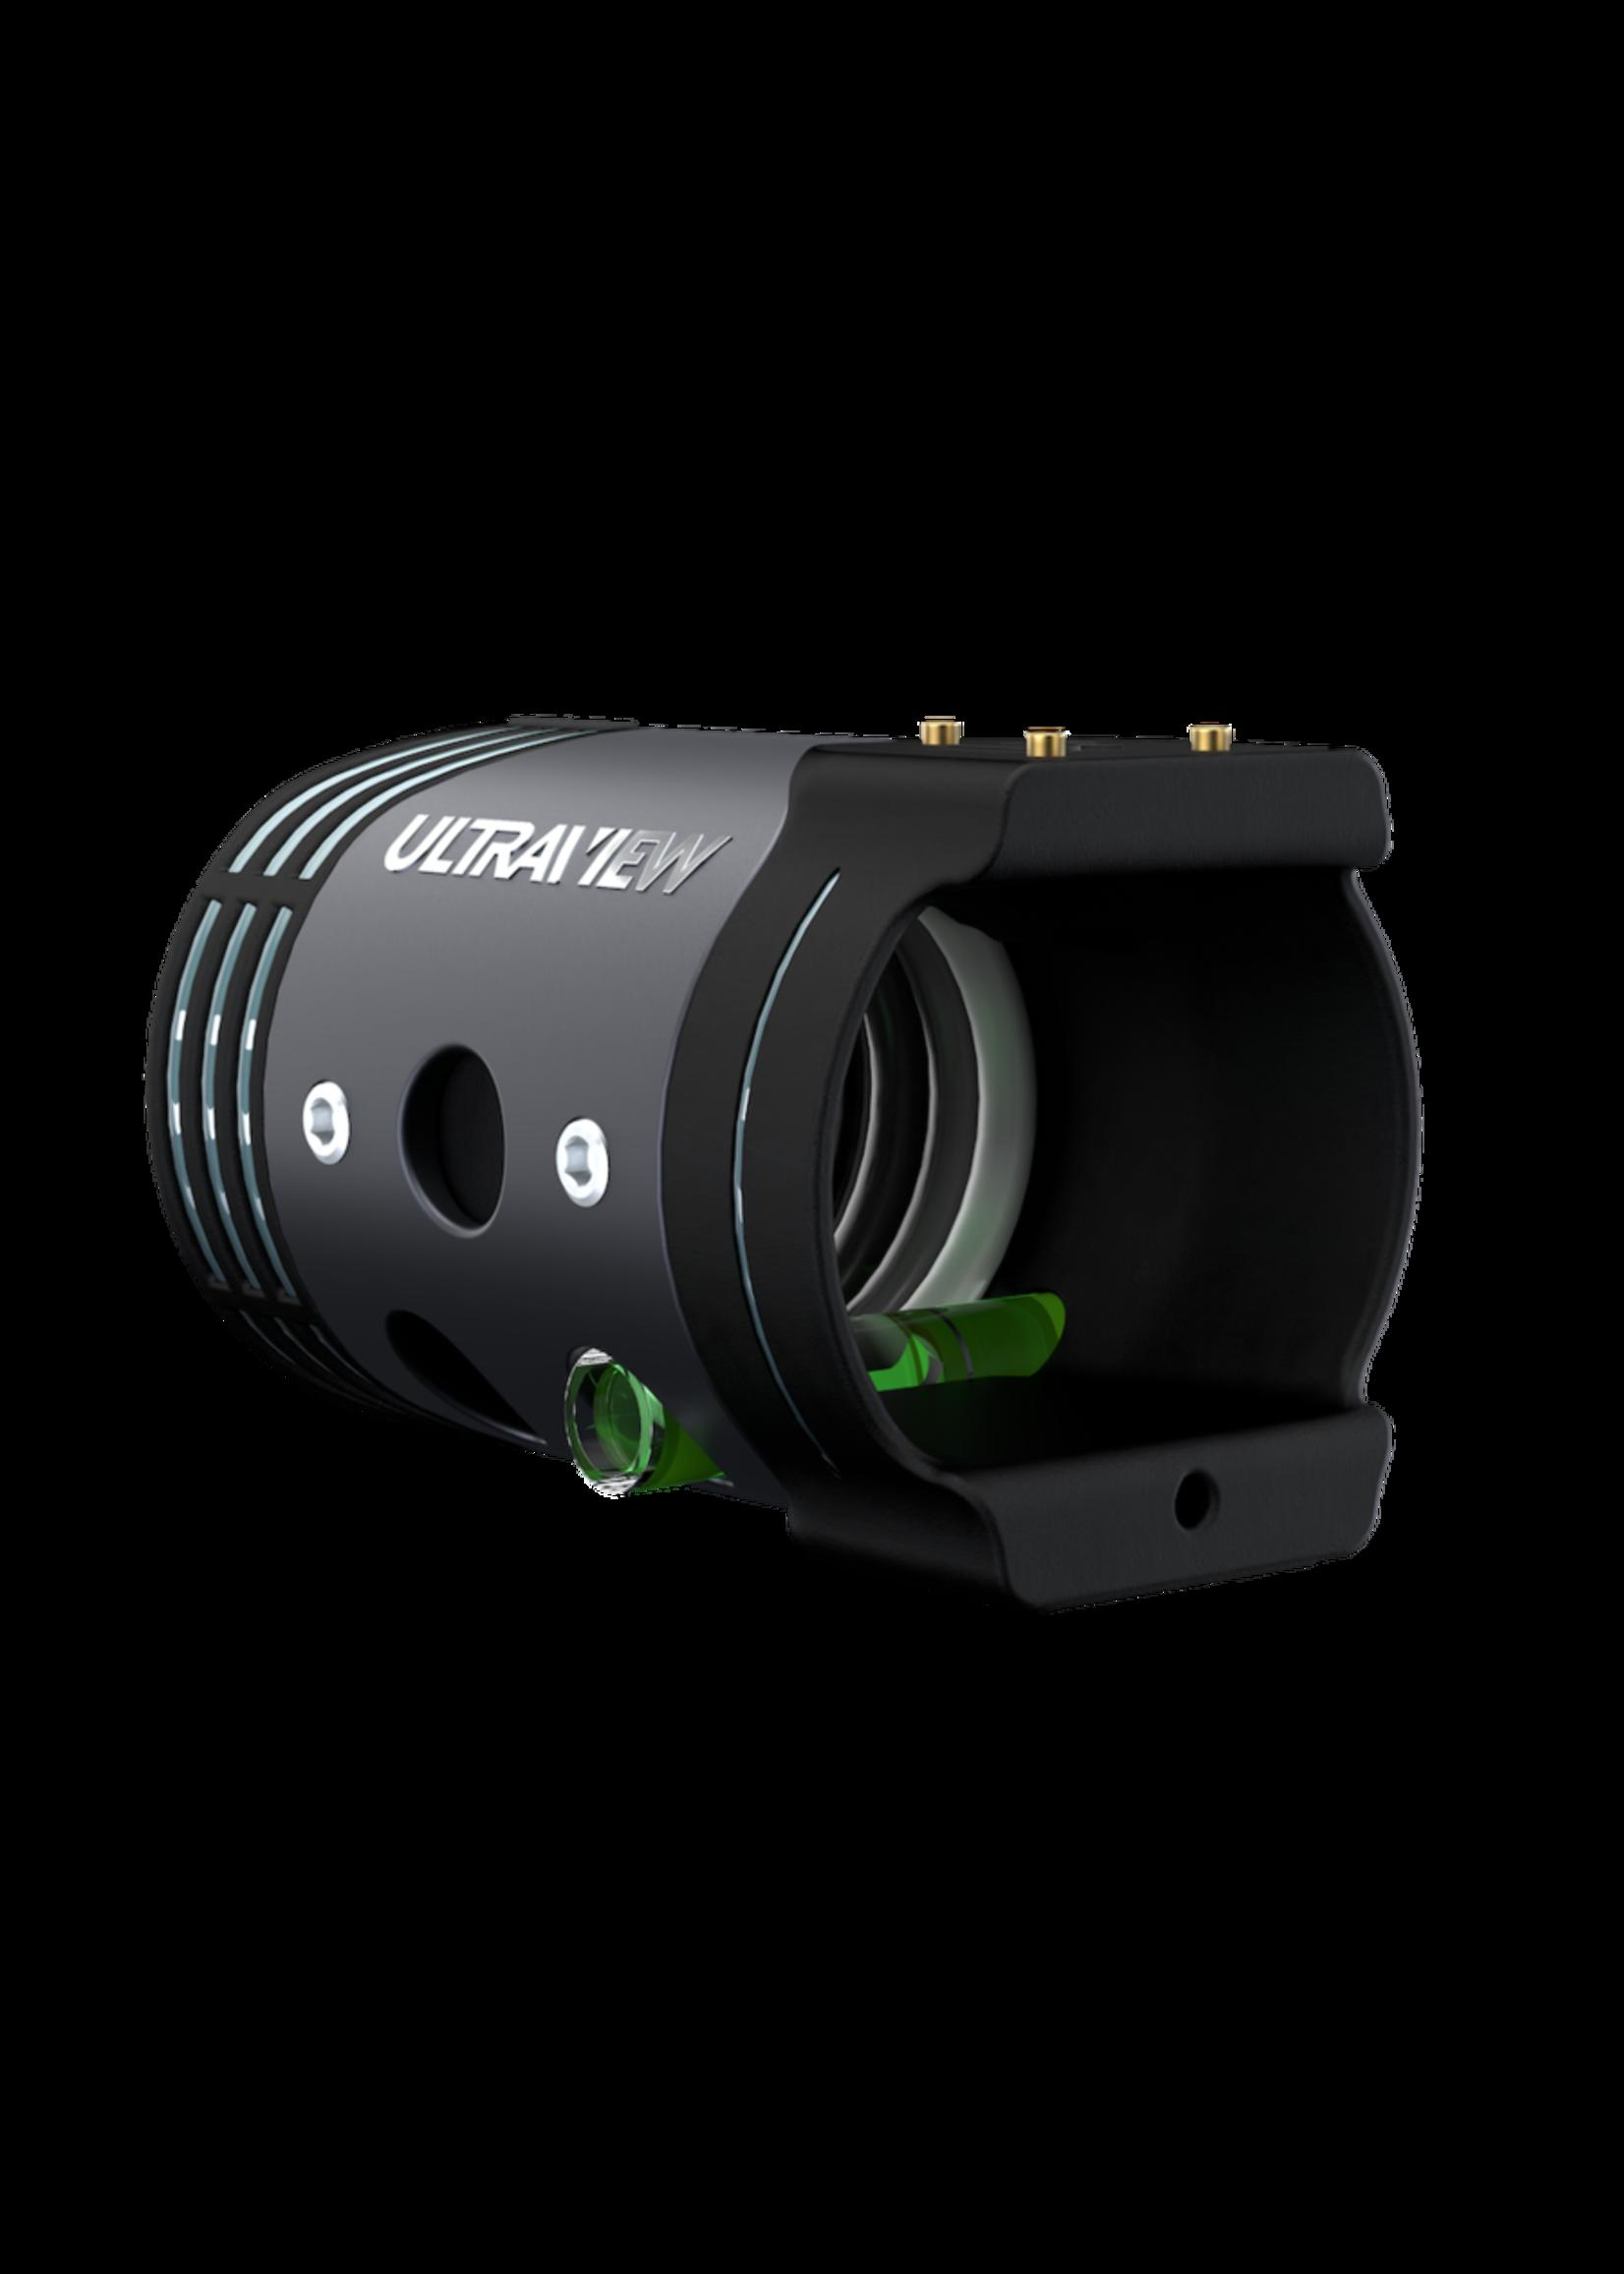 UltraView Ultraview UV3XL Target Kit